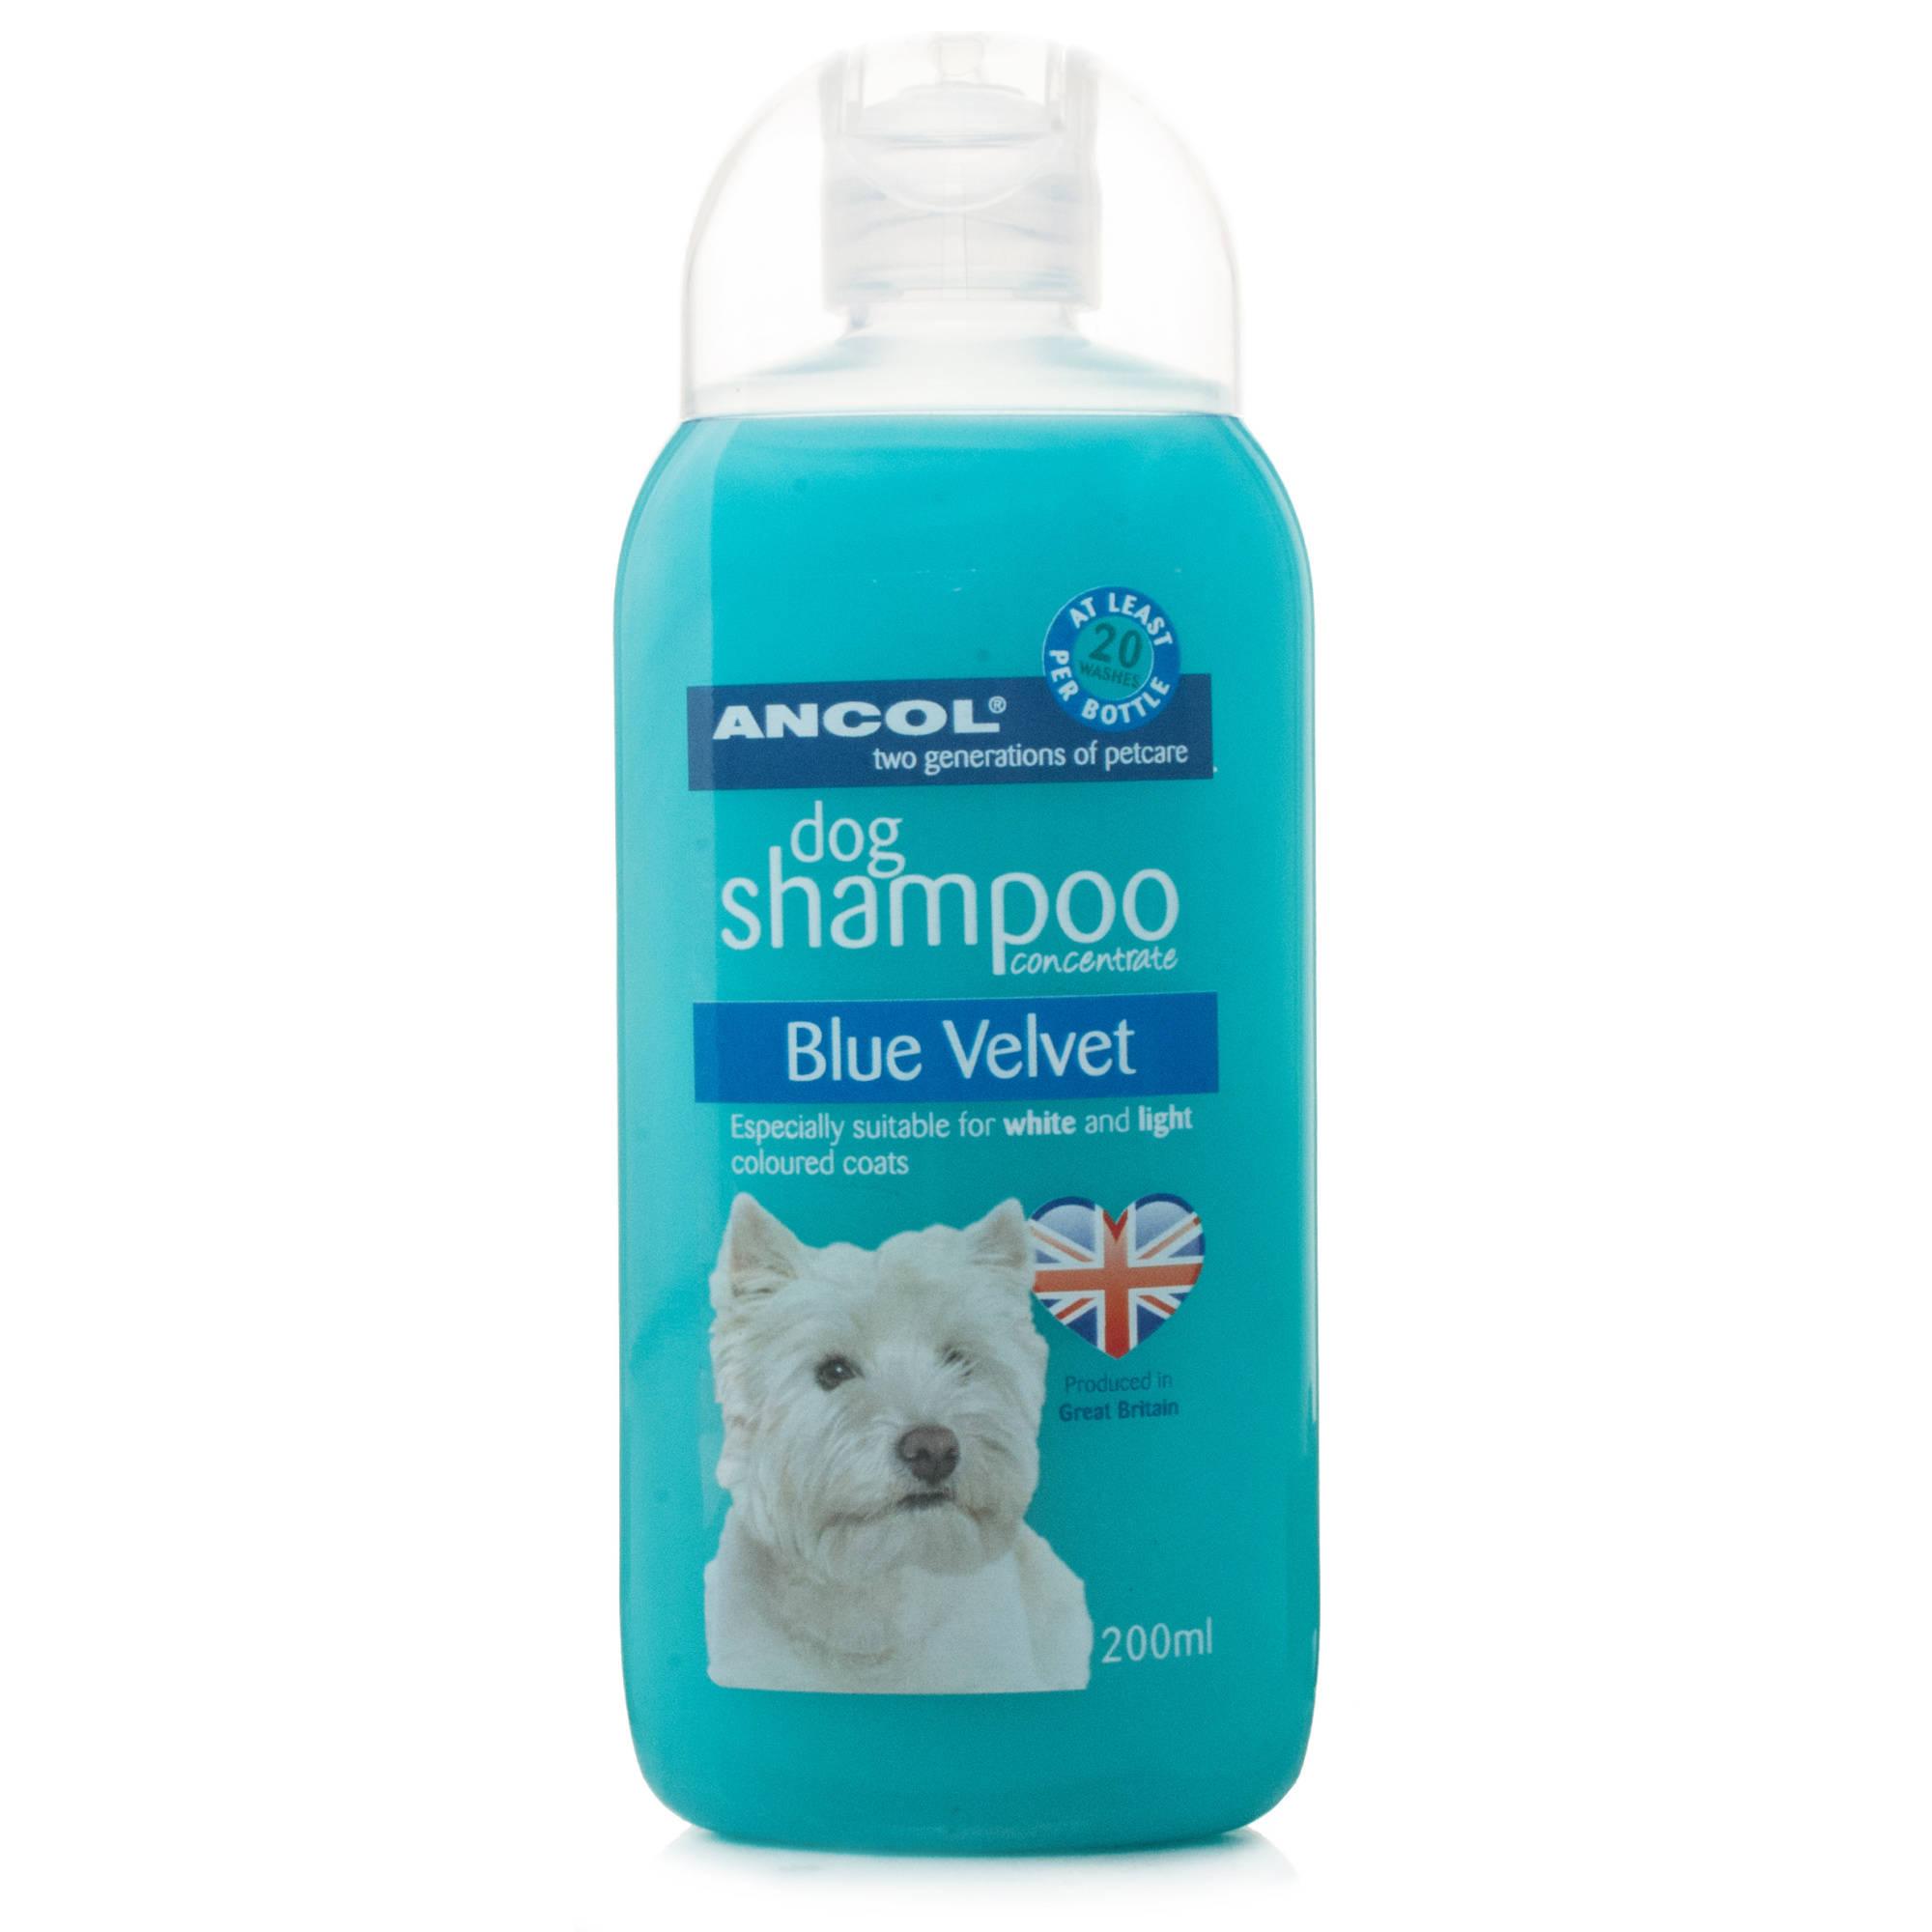 Dog Shampoo Reviews Uk